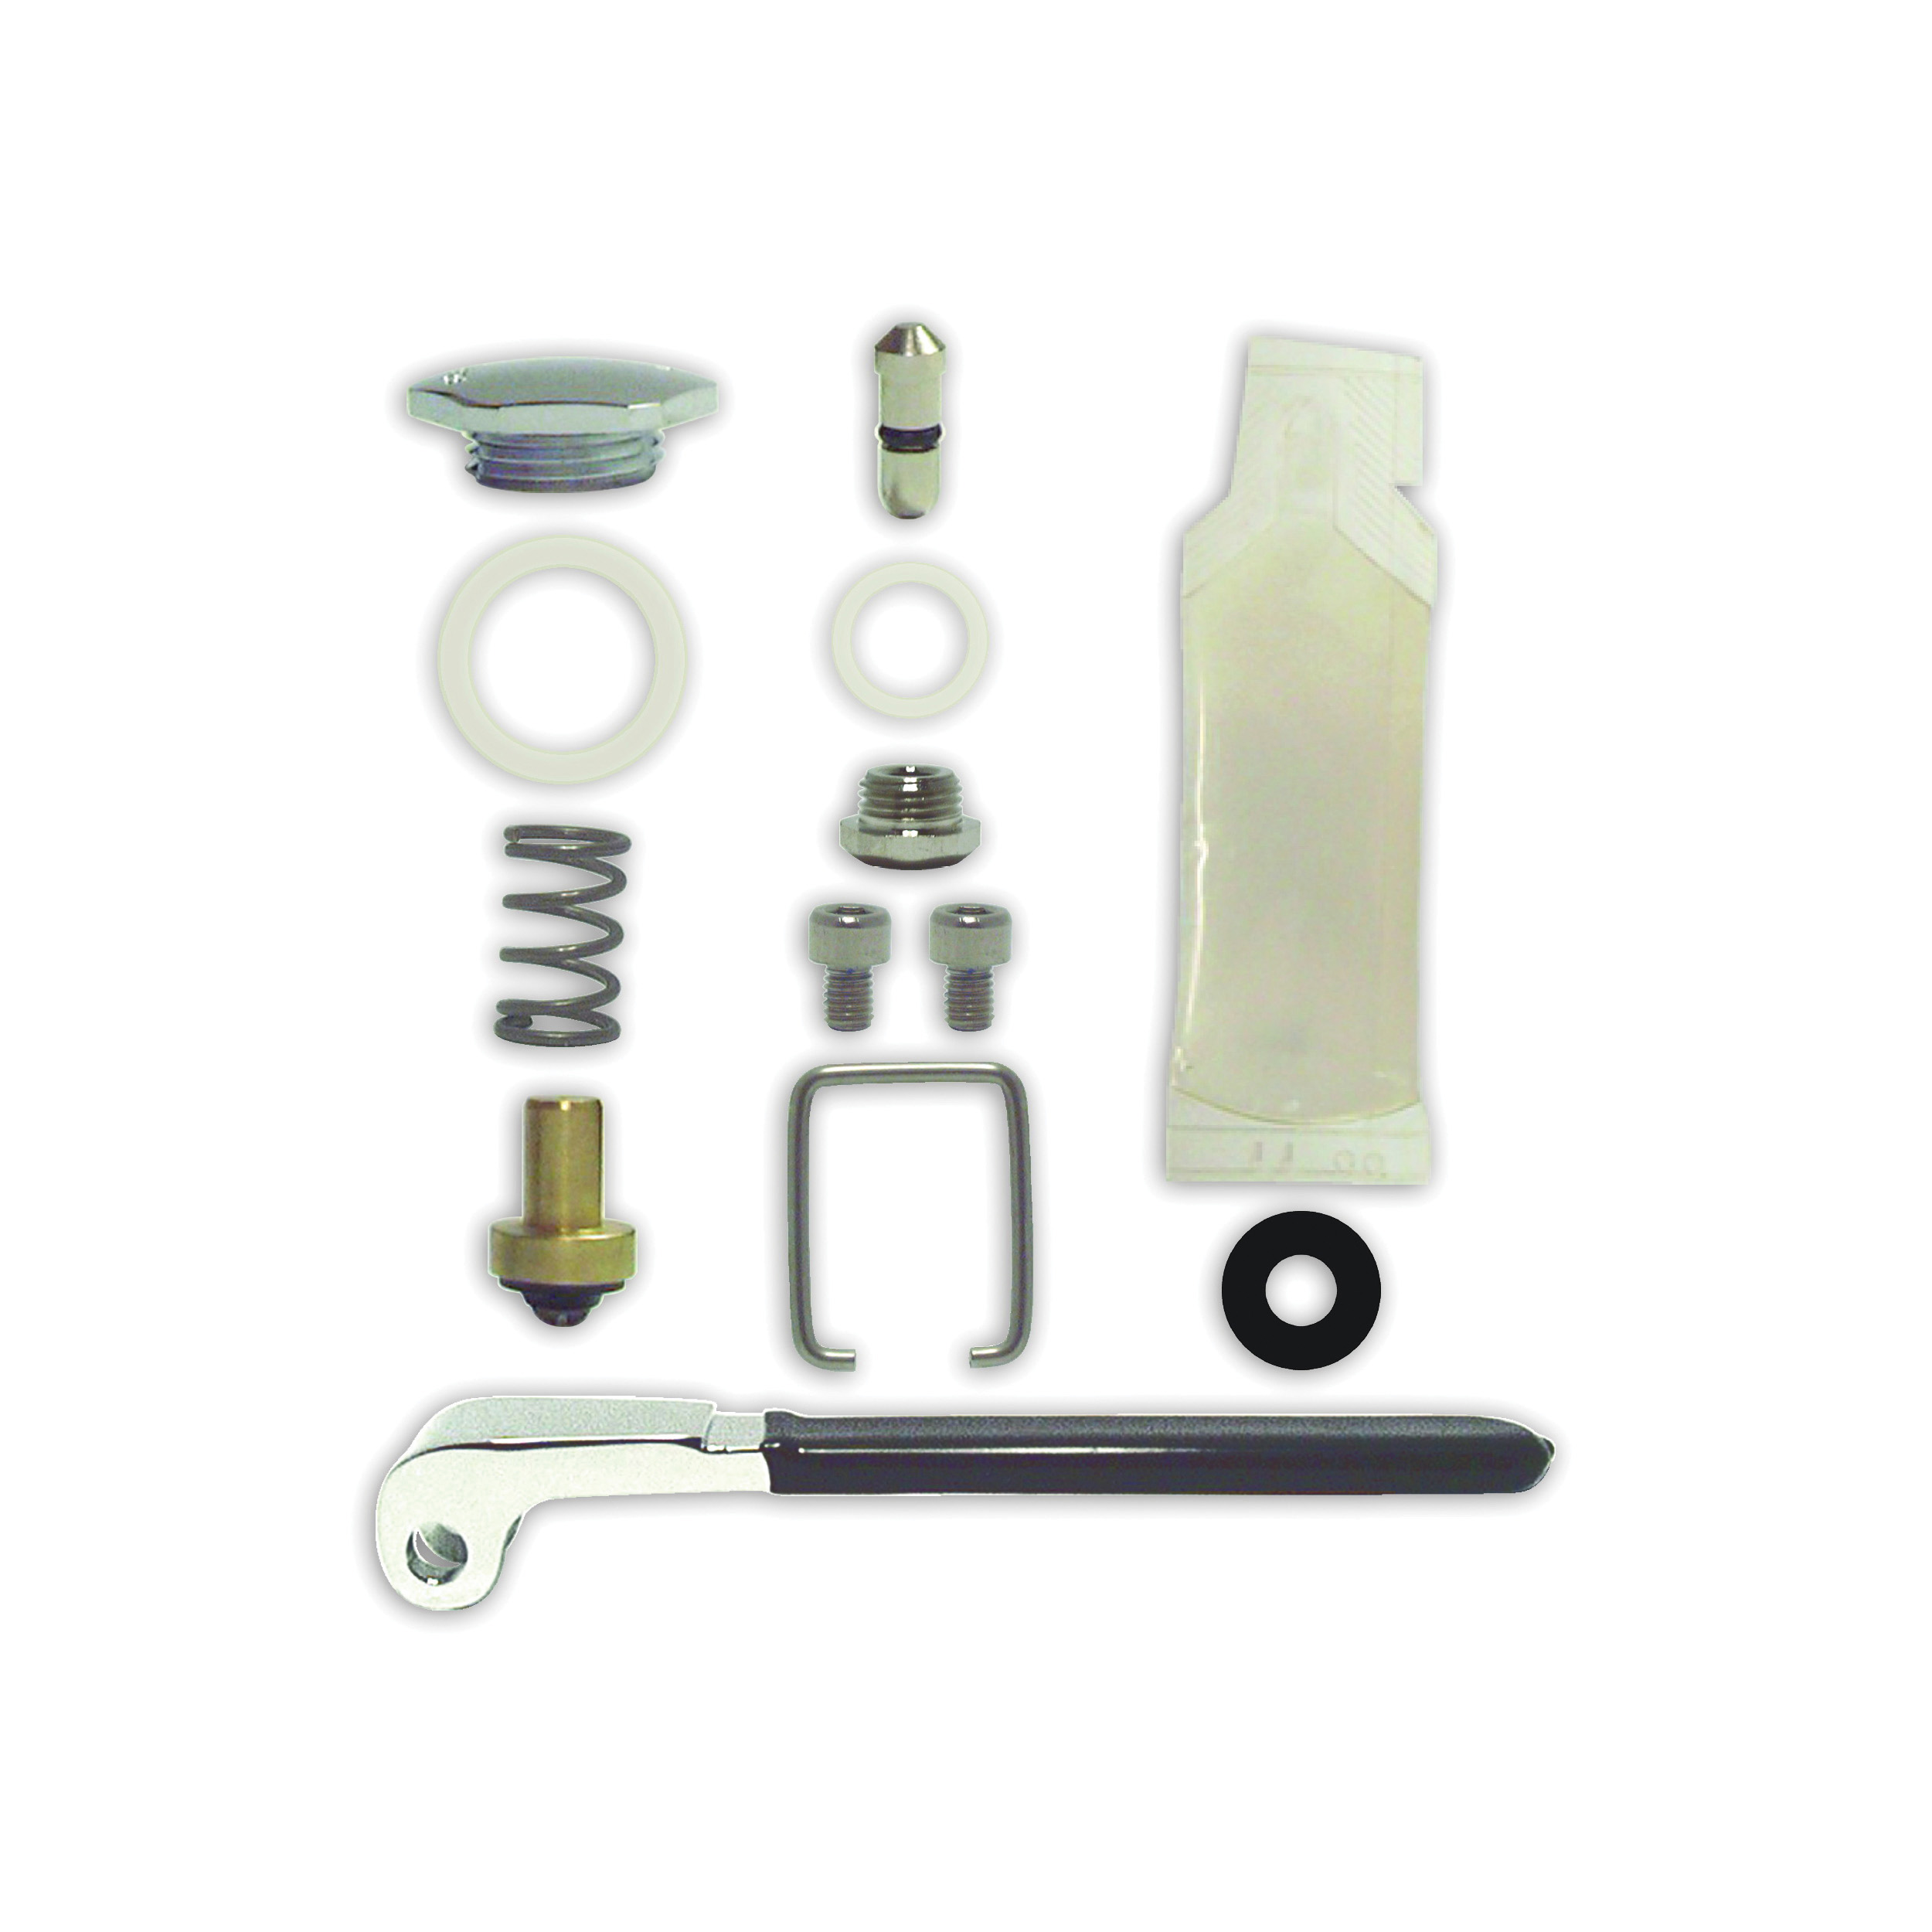 Fisher 11355 Spray Valve Repair Kit, For Use With Model 2949 Pre-Rinse Ultra™ Spray Valve, Brass, Domestic